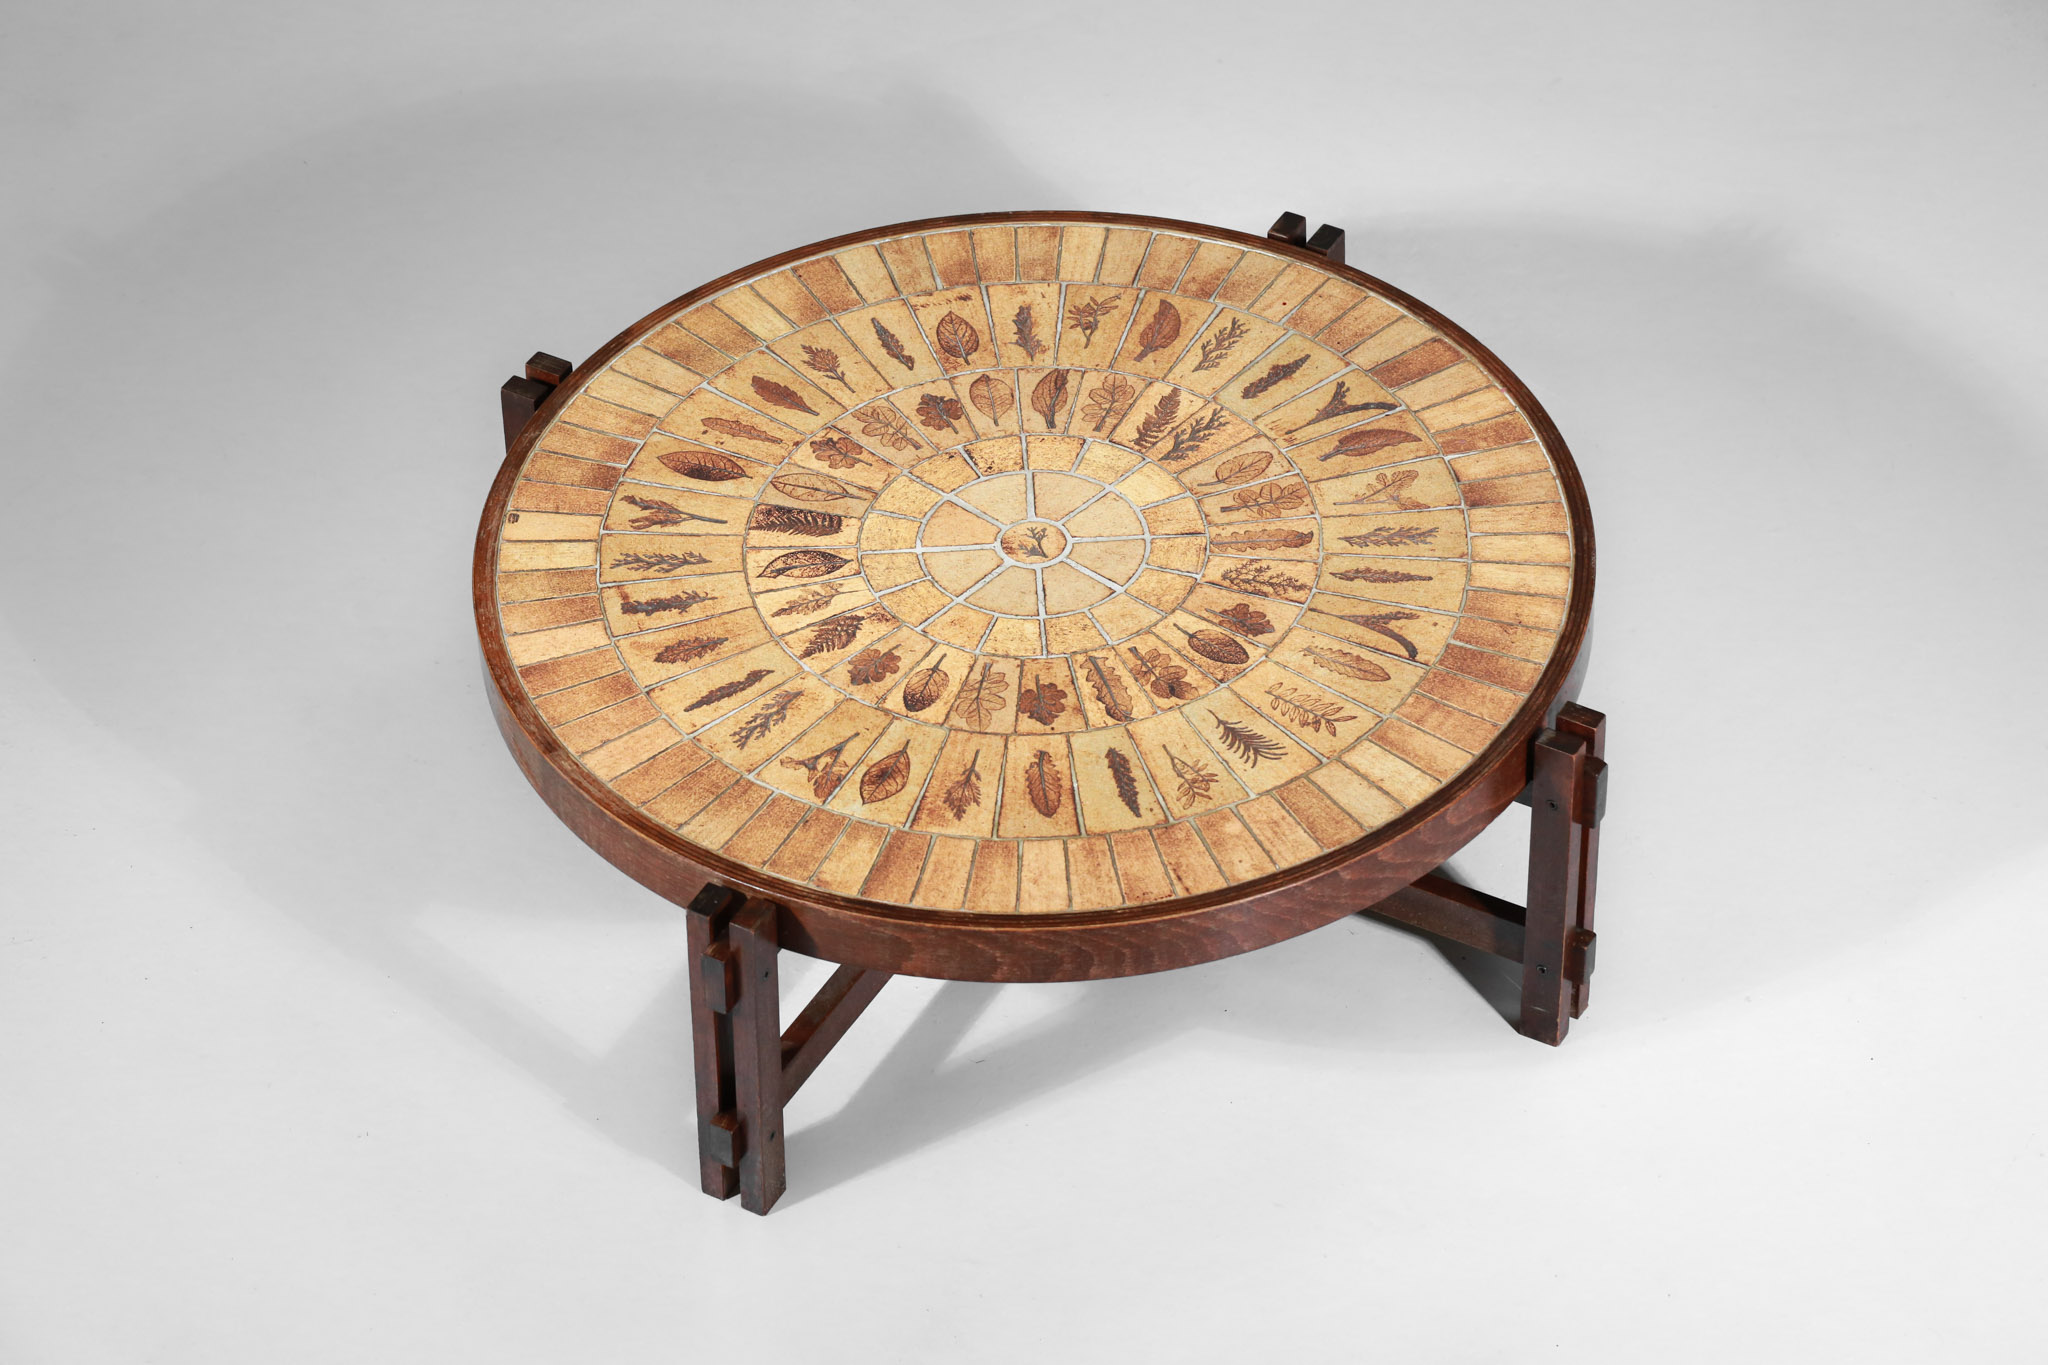 table basse ceramique roger capron modele herbier français - Danke Galerie